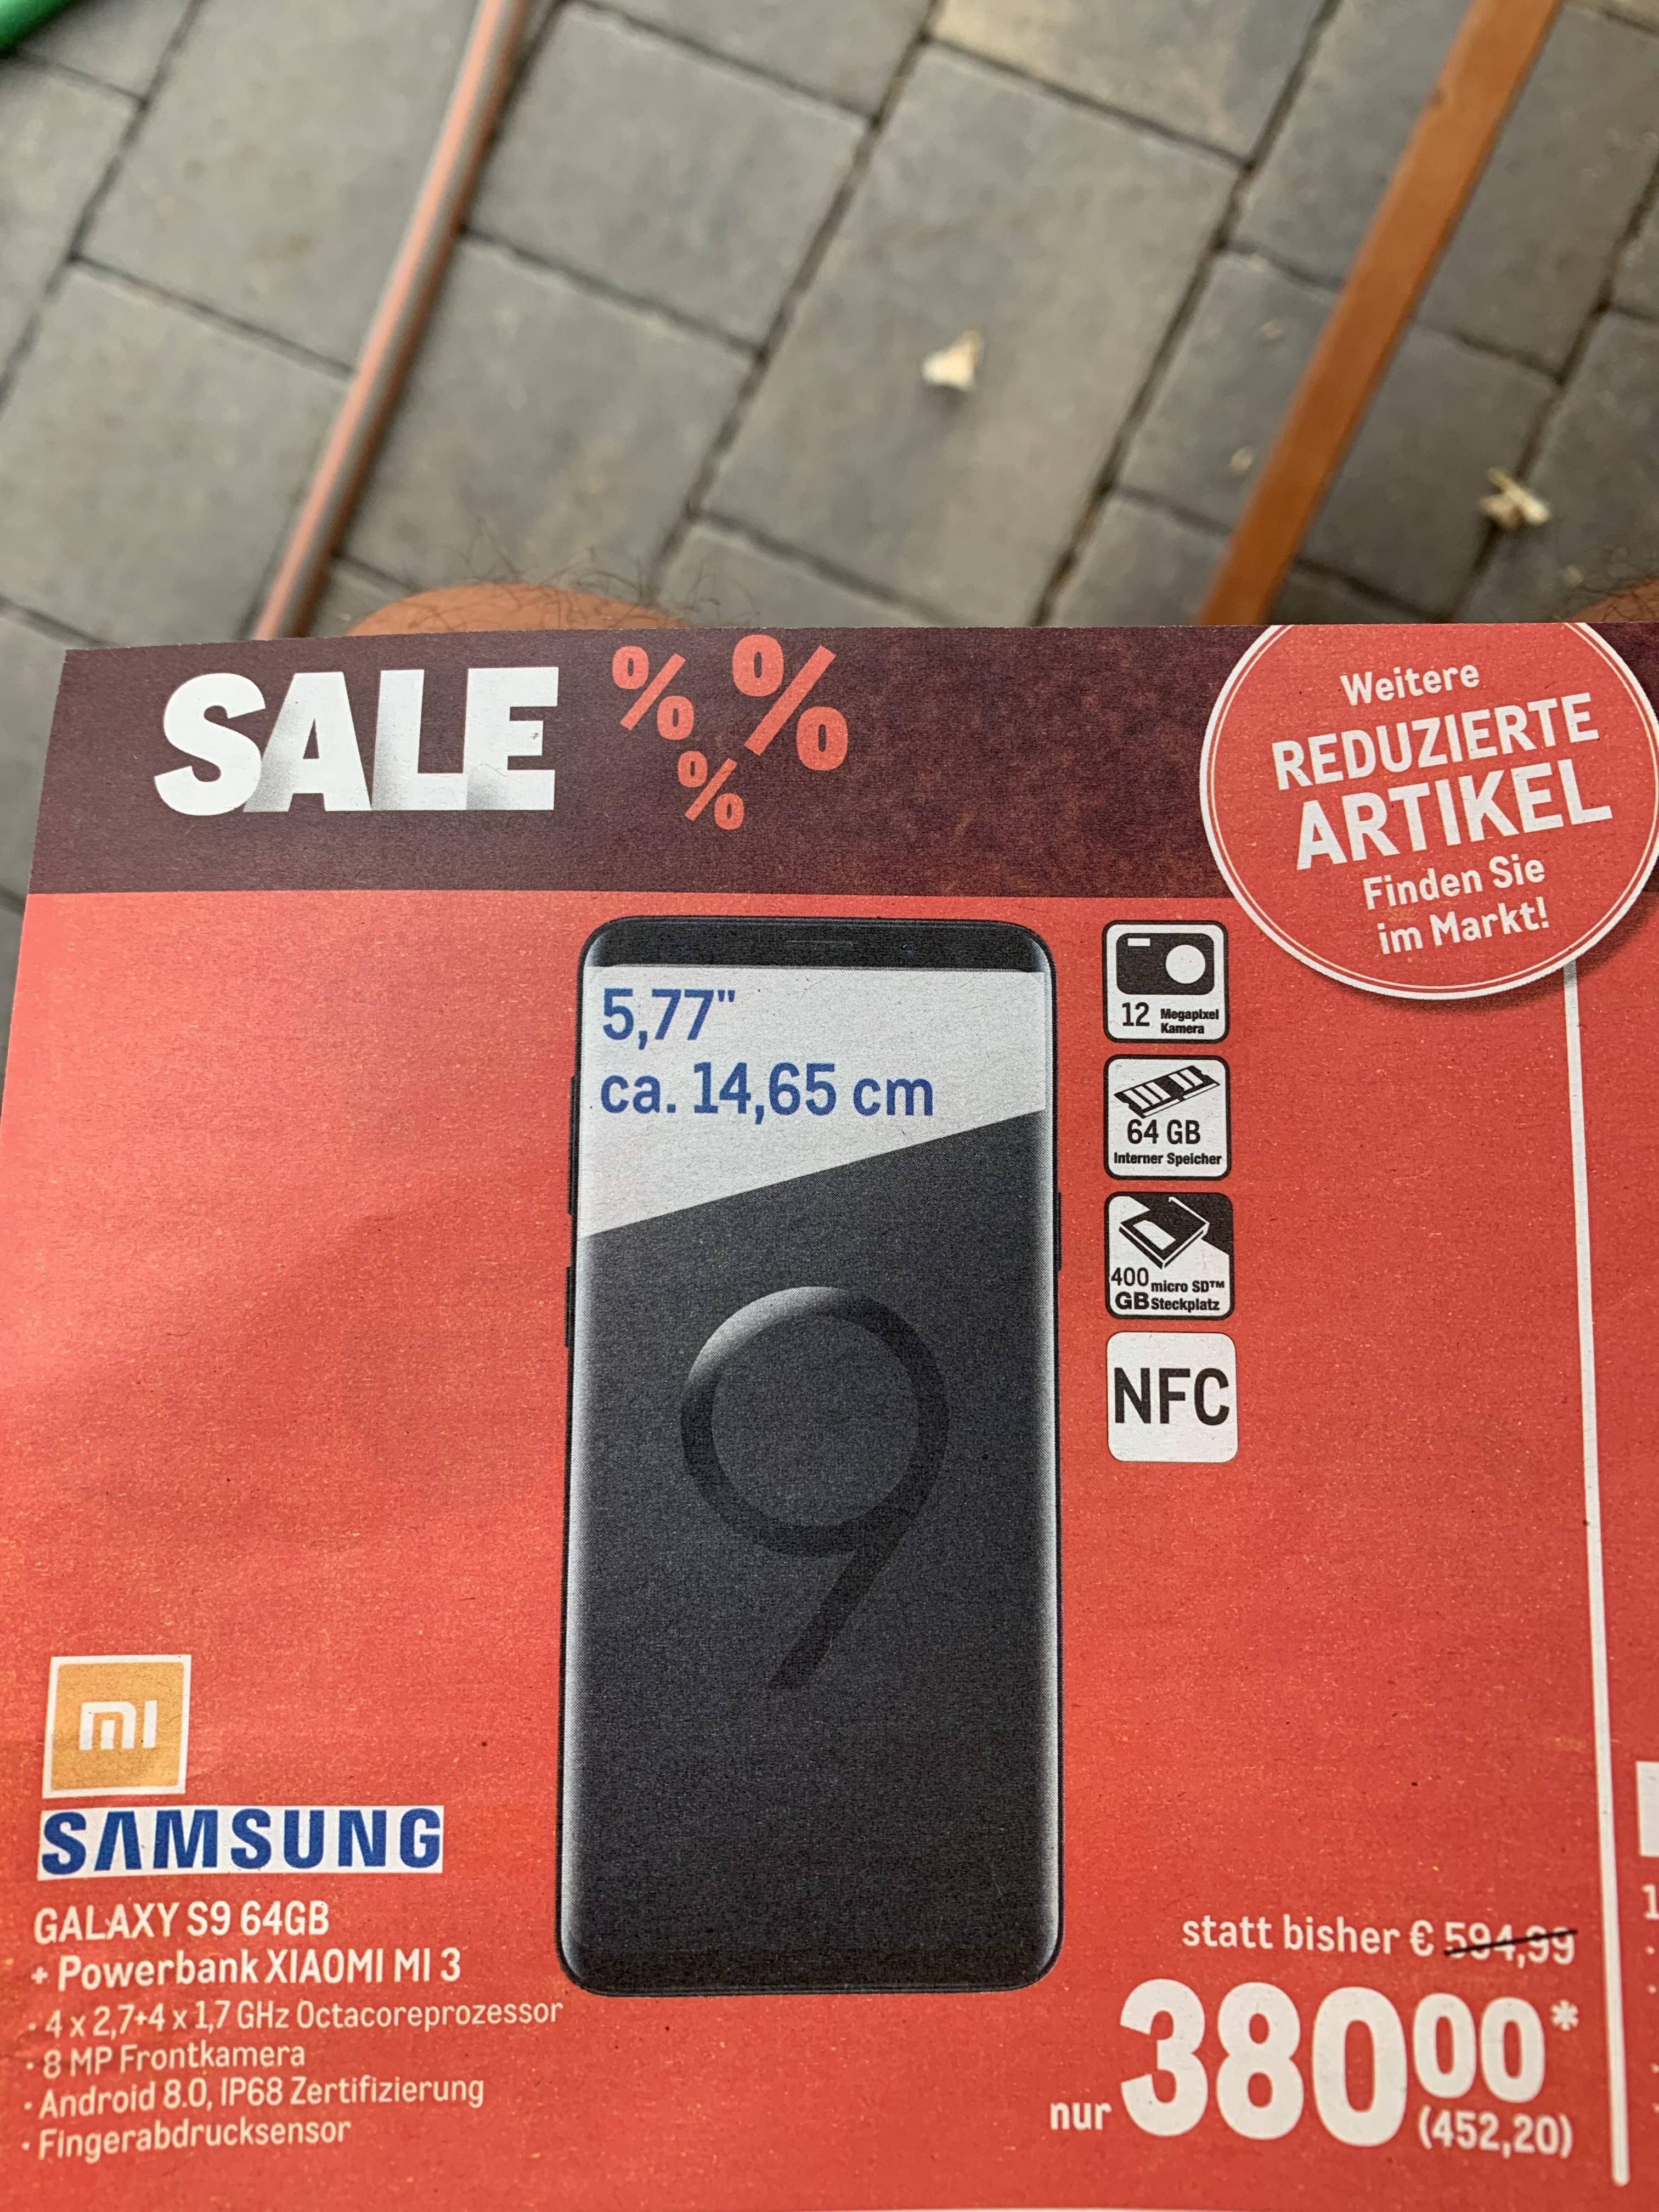 Sale in der Metro Samsung S9 64 GB plus Powerbank